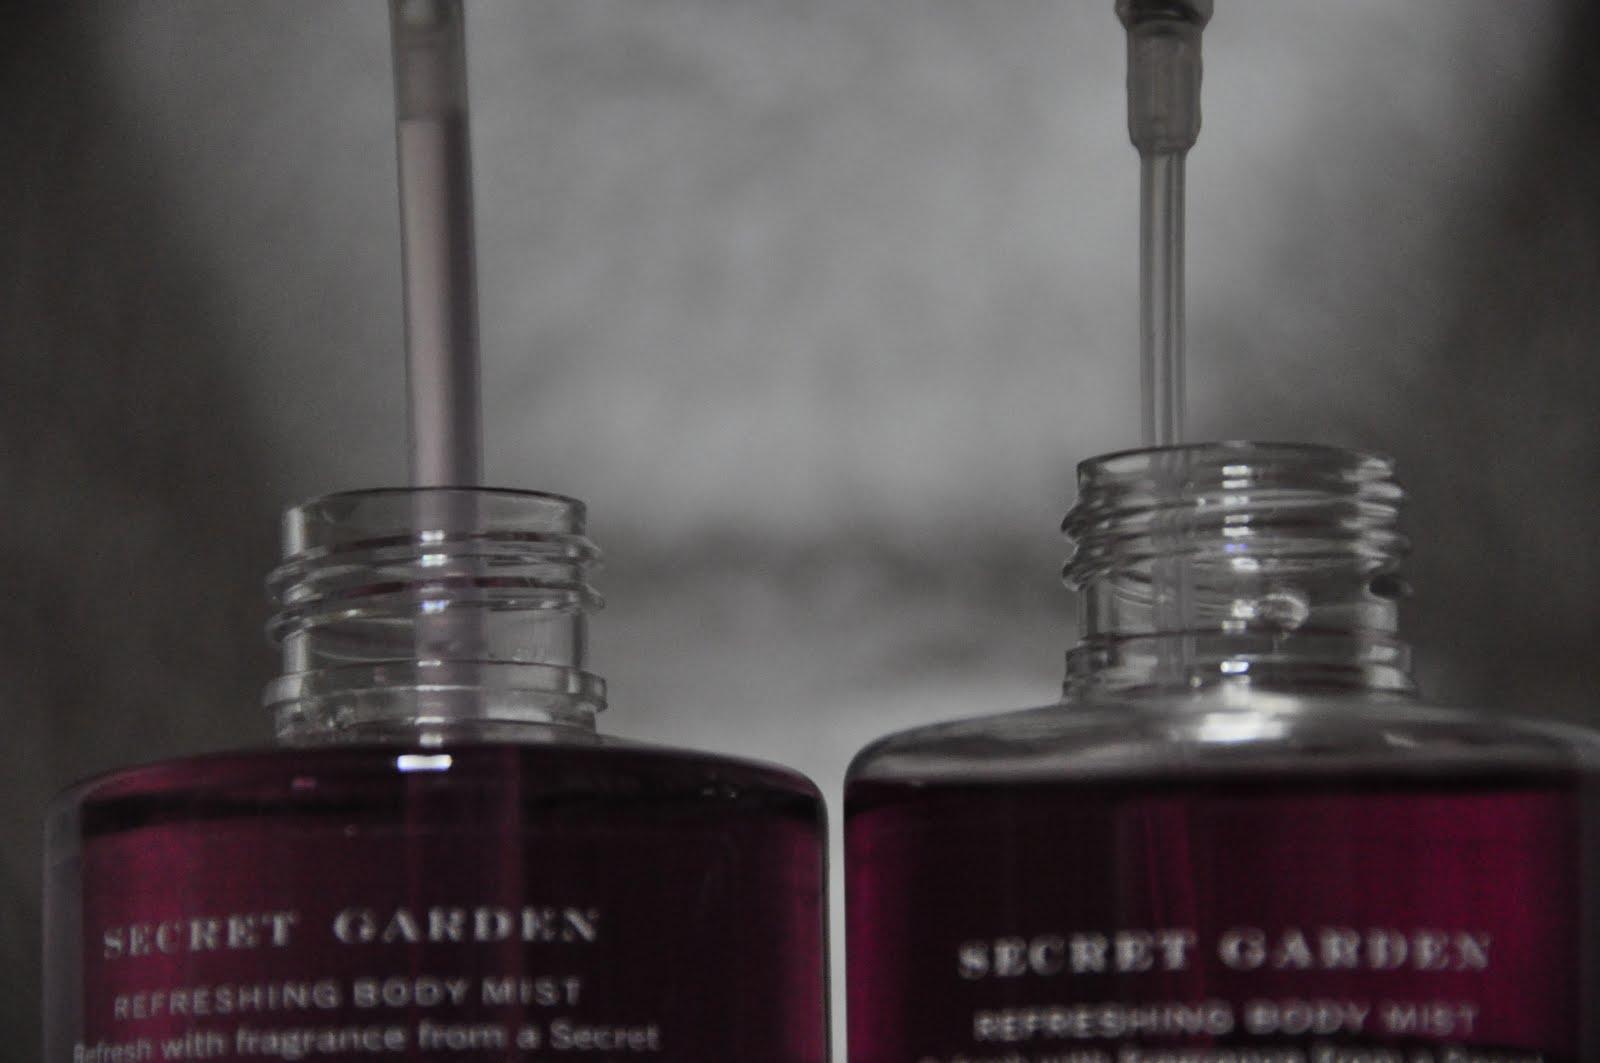 6 ways to distinguish the original from the fake perfume